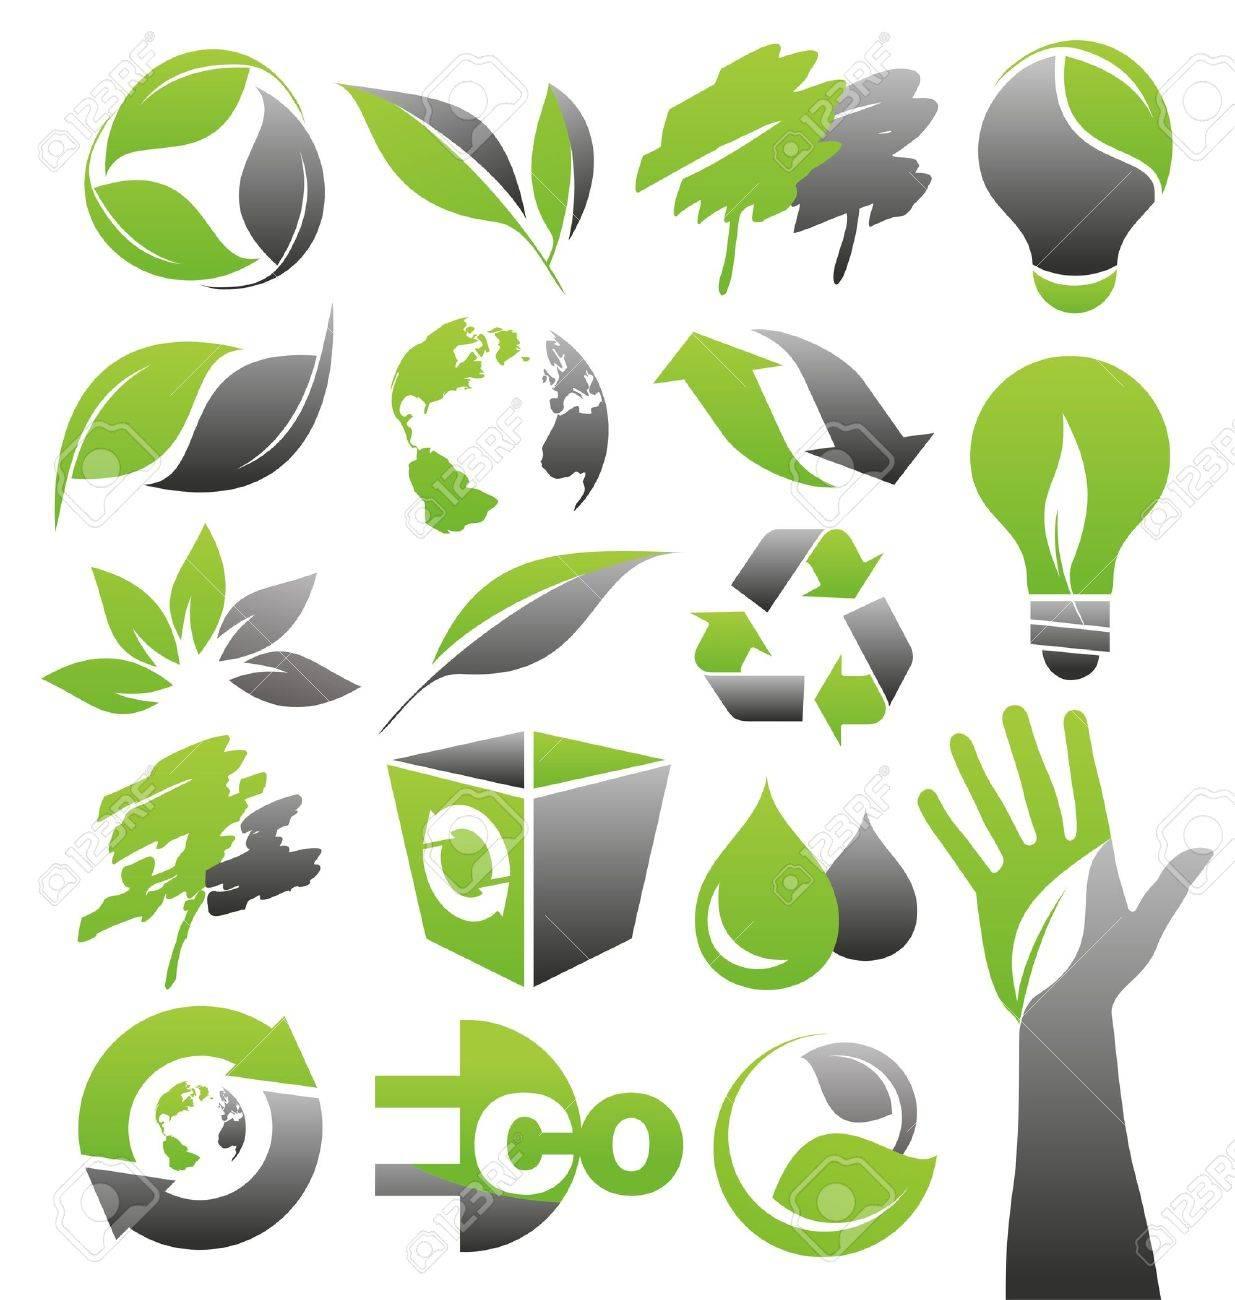 tree logo cliparts stock vector and royalty tree logo tree logo ecology green icons vector set